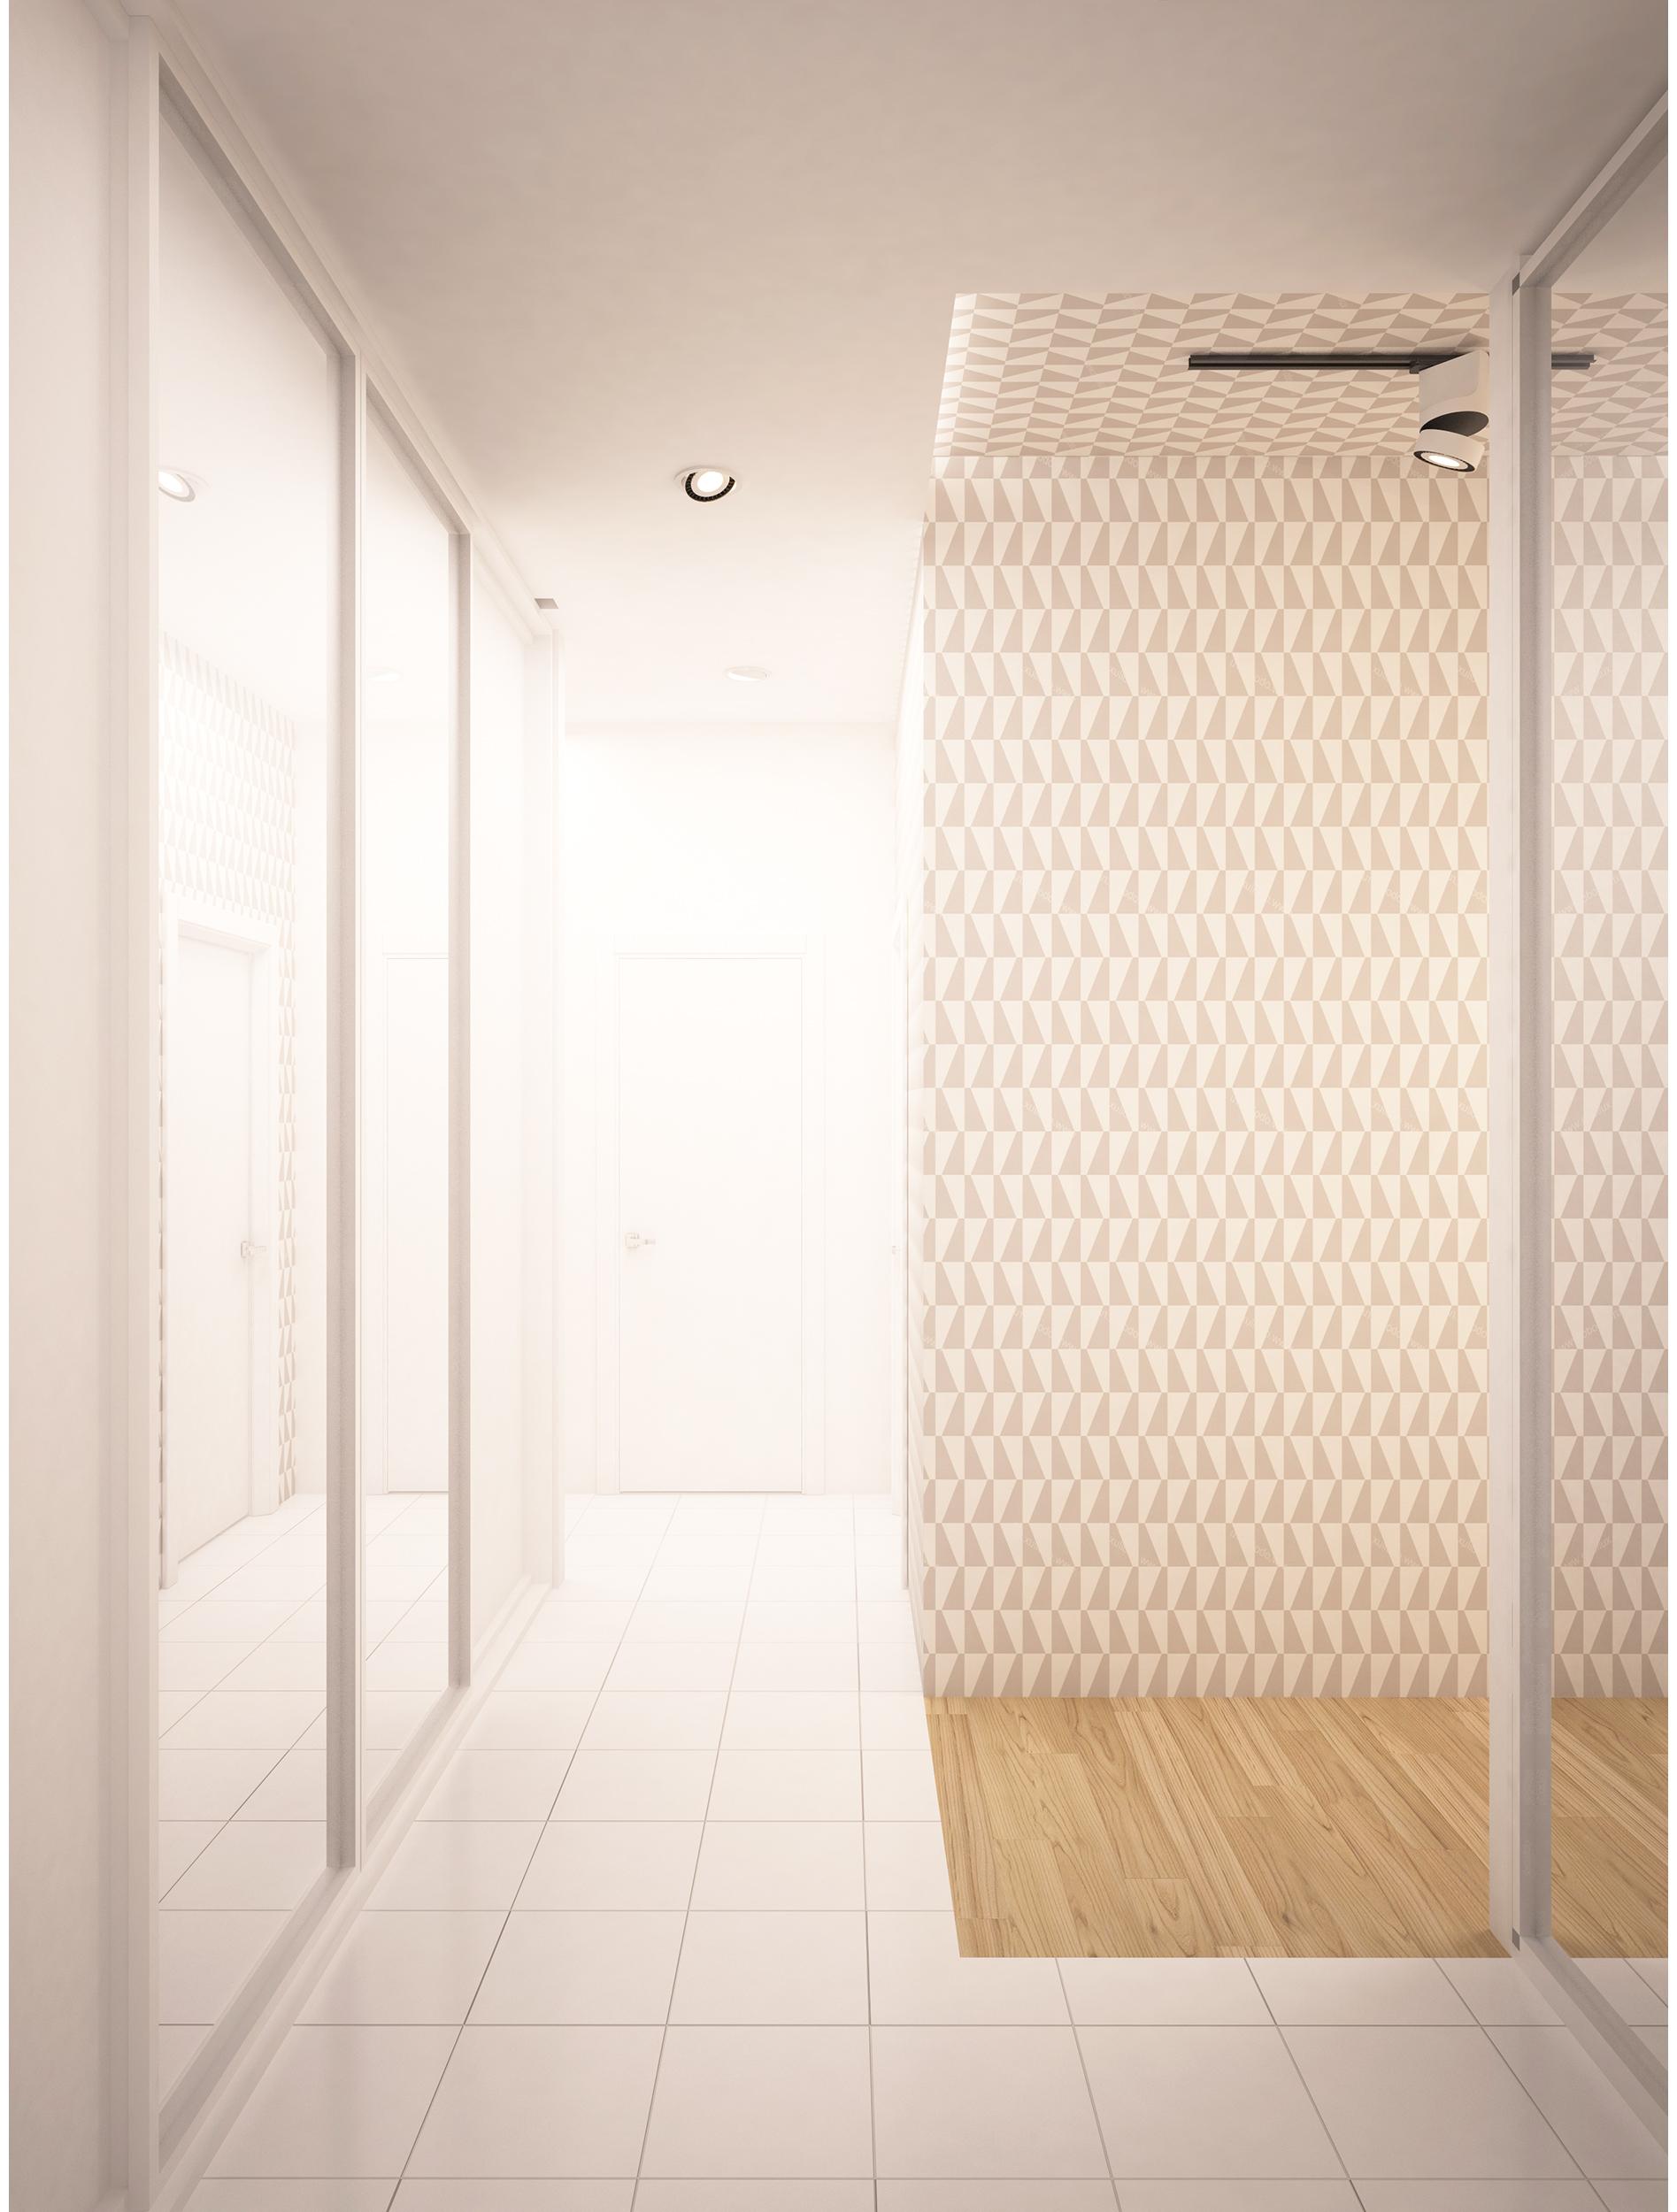 Copy of Scandinavian style apartment interior. Hallway